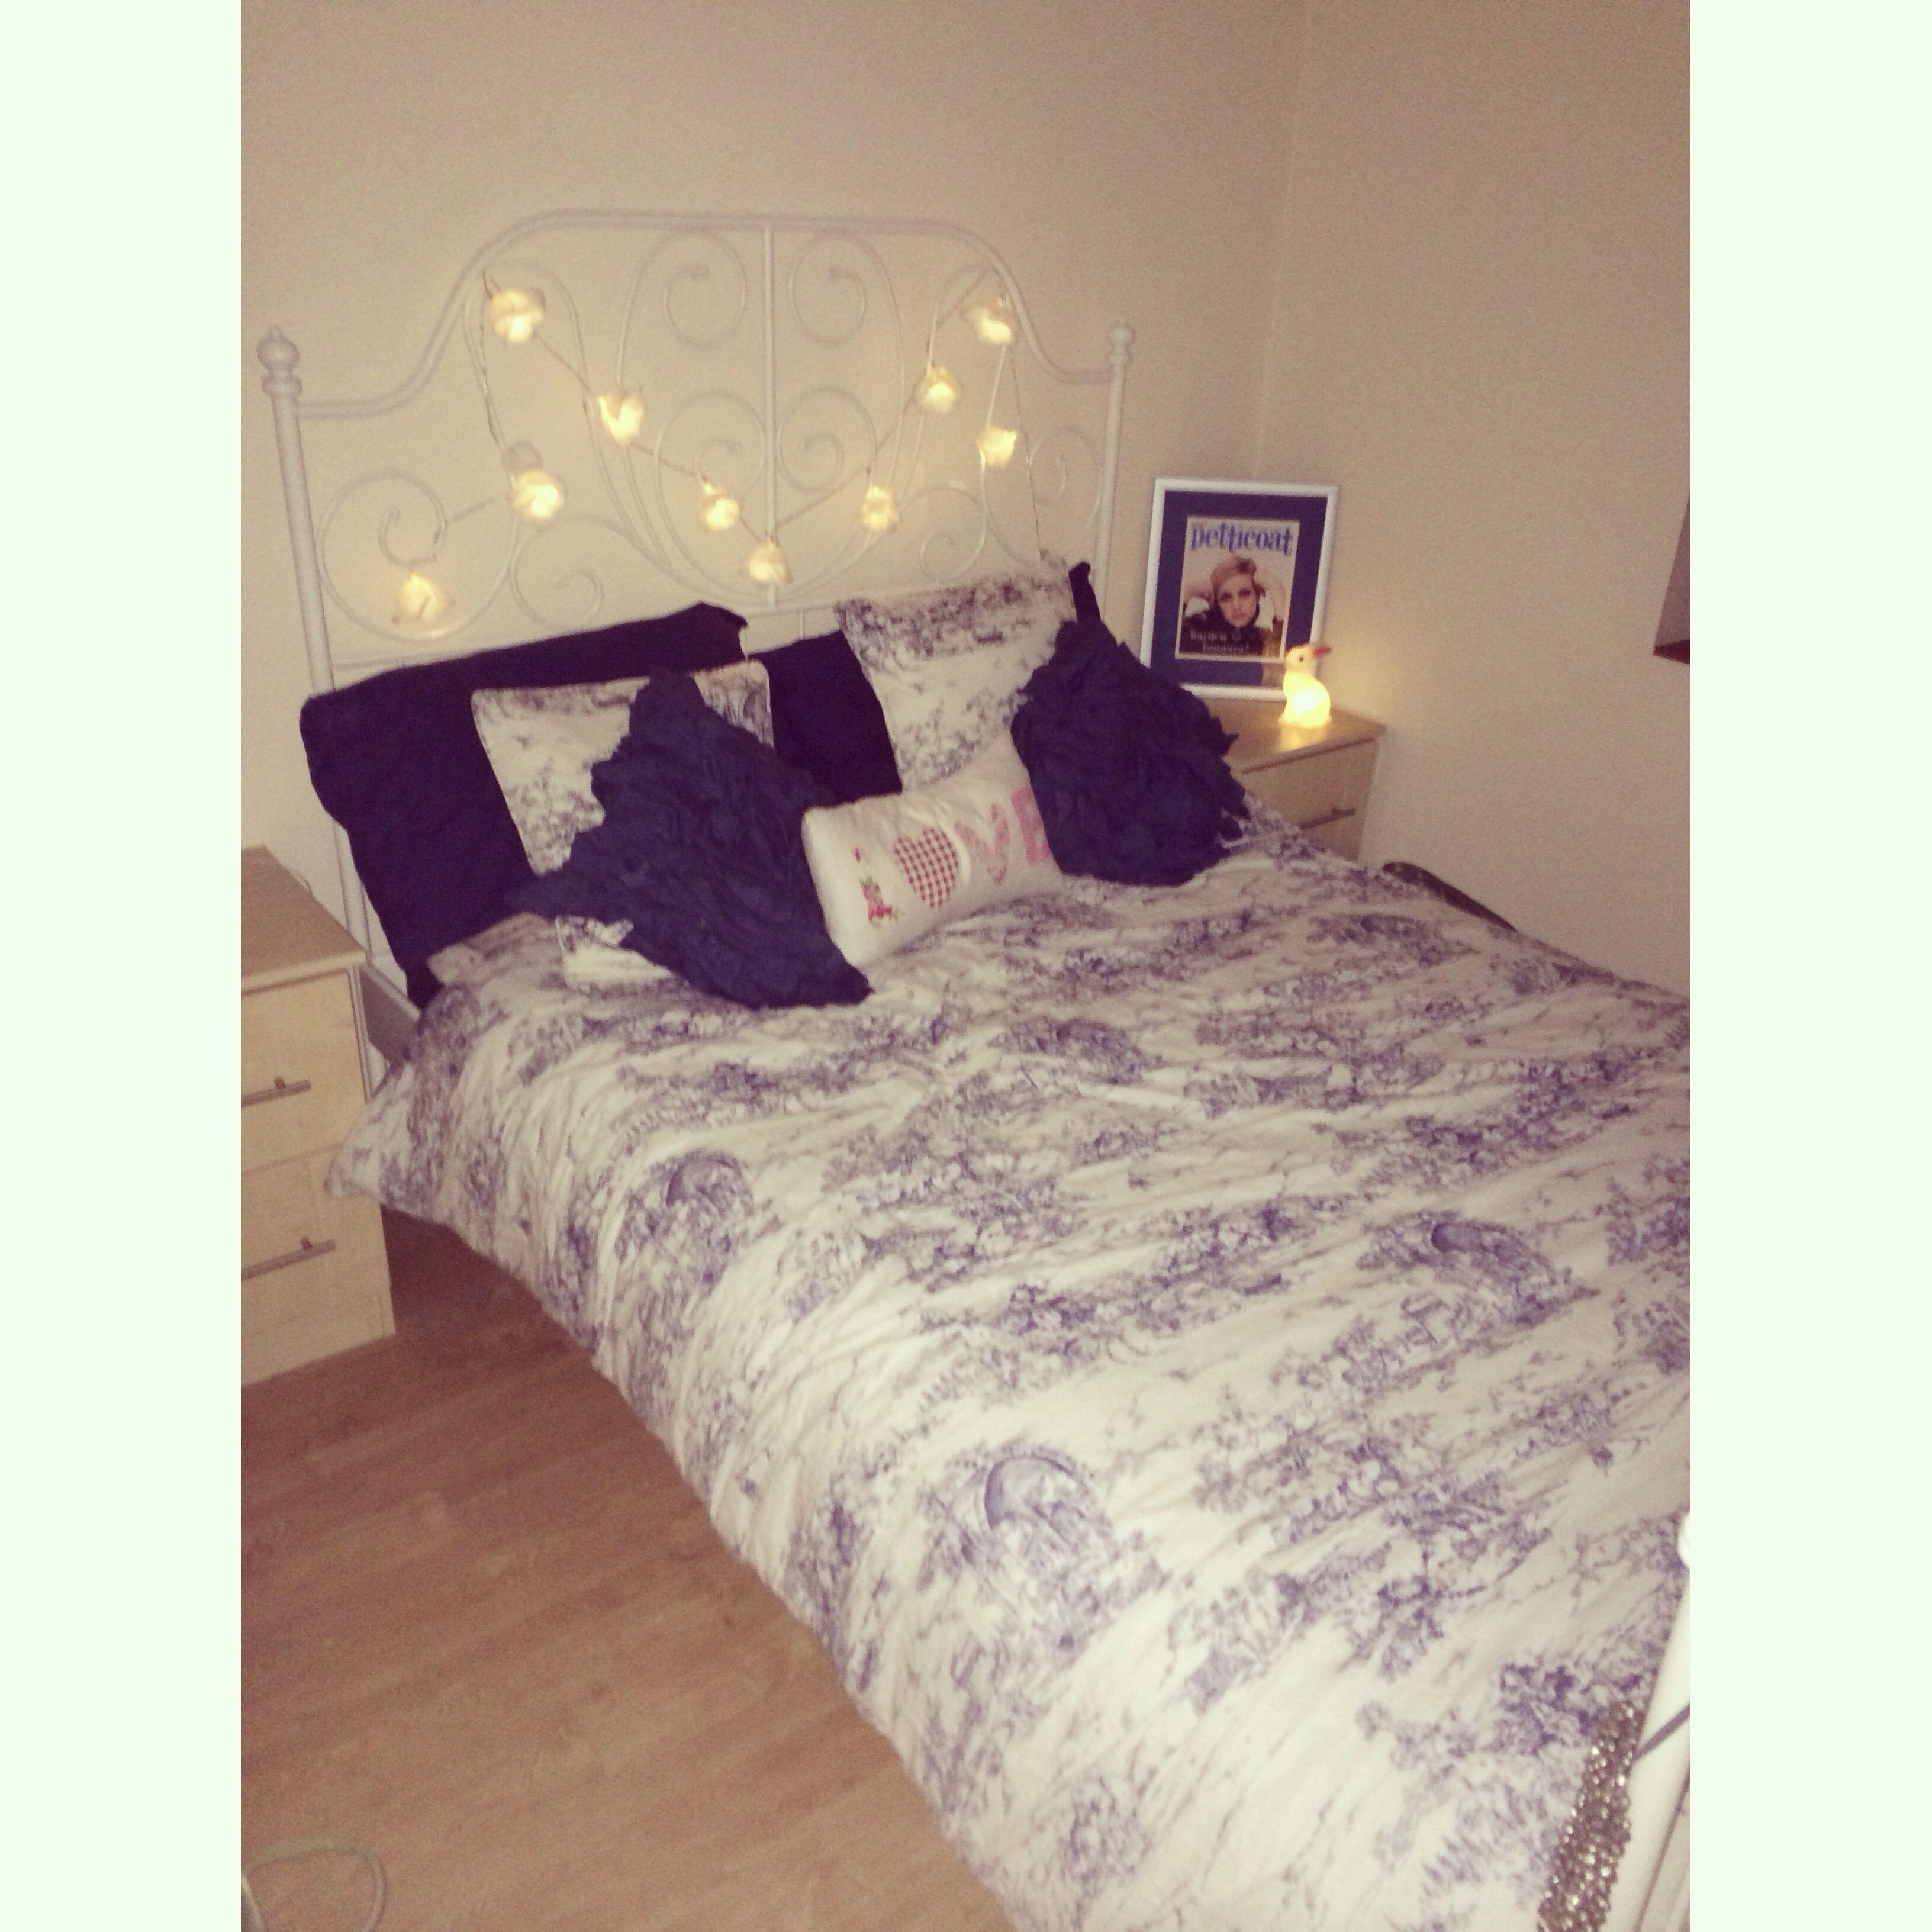 Leirvik ikea bed. Fairy lights. Twiggy.   deco   Pinterest   Ikea ...